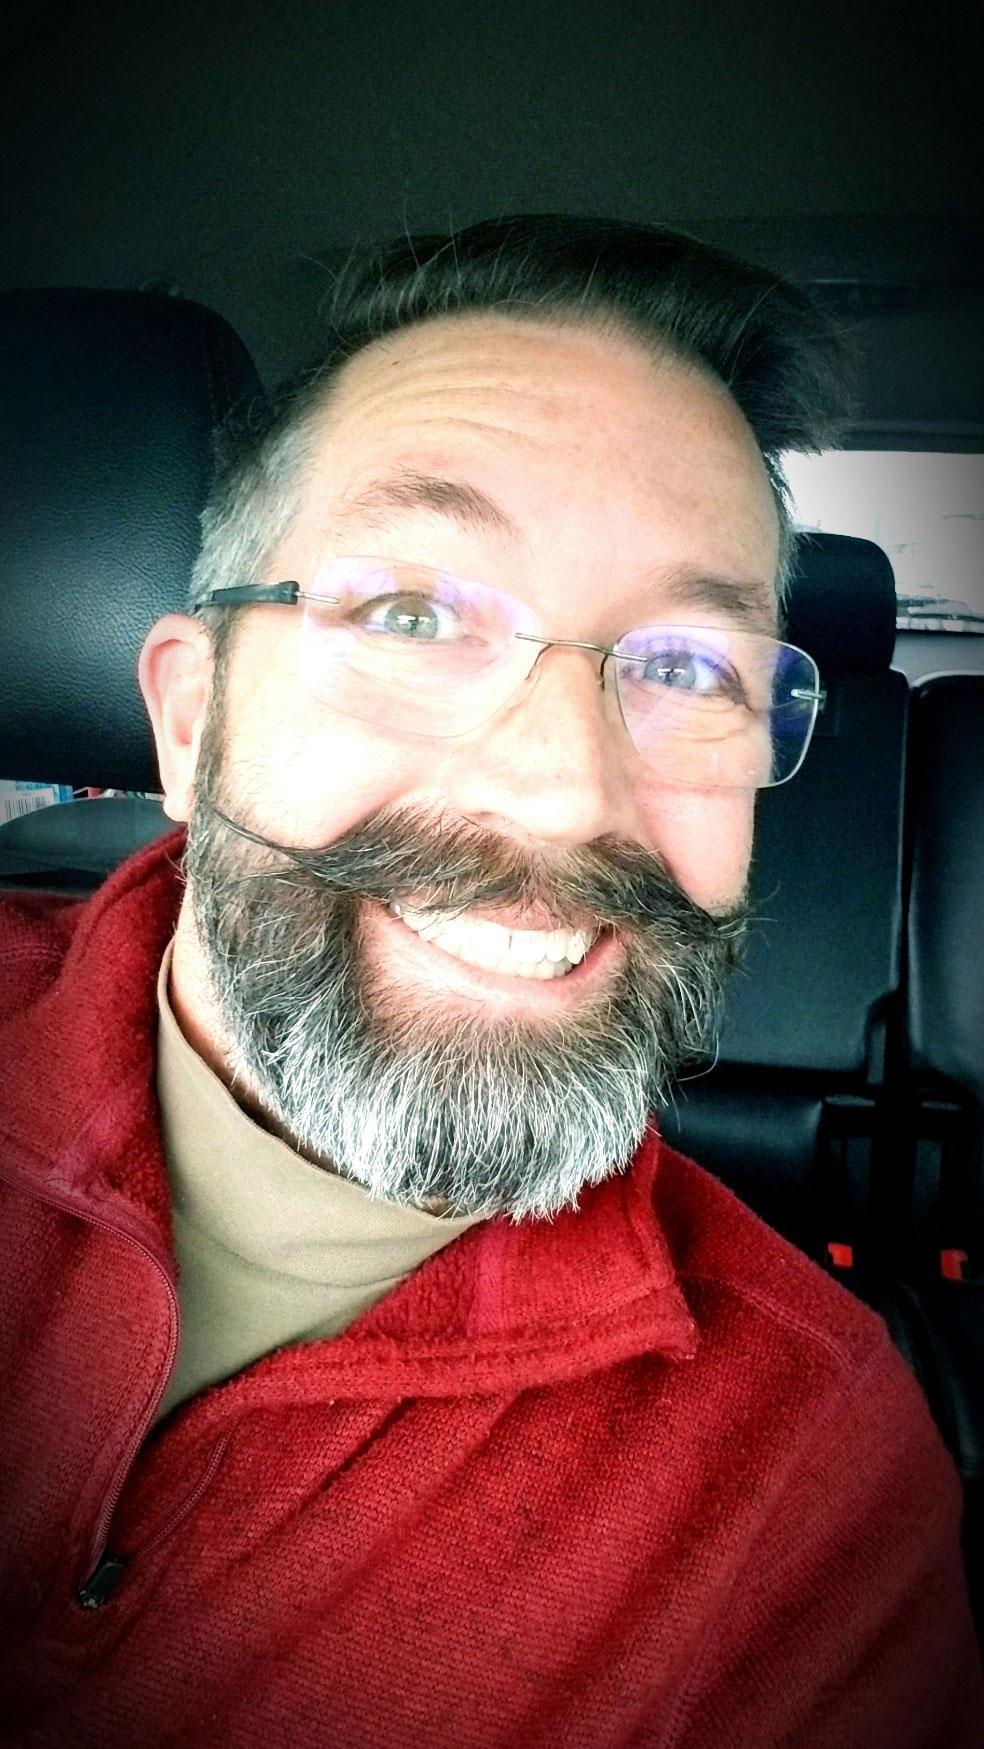 A Dapper Mustache!